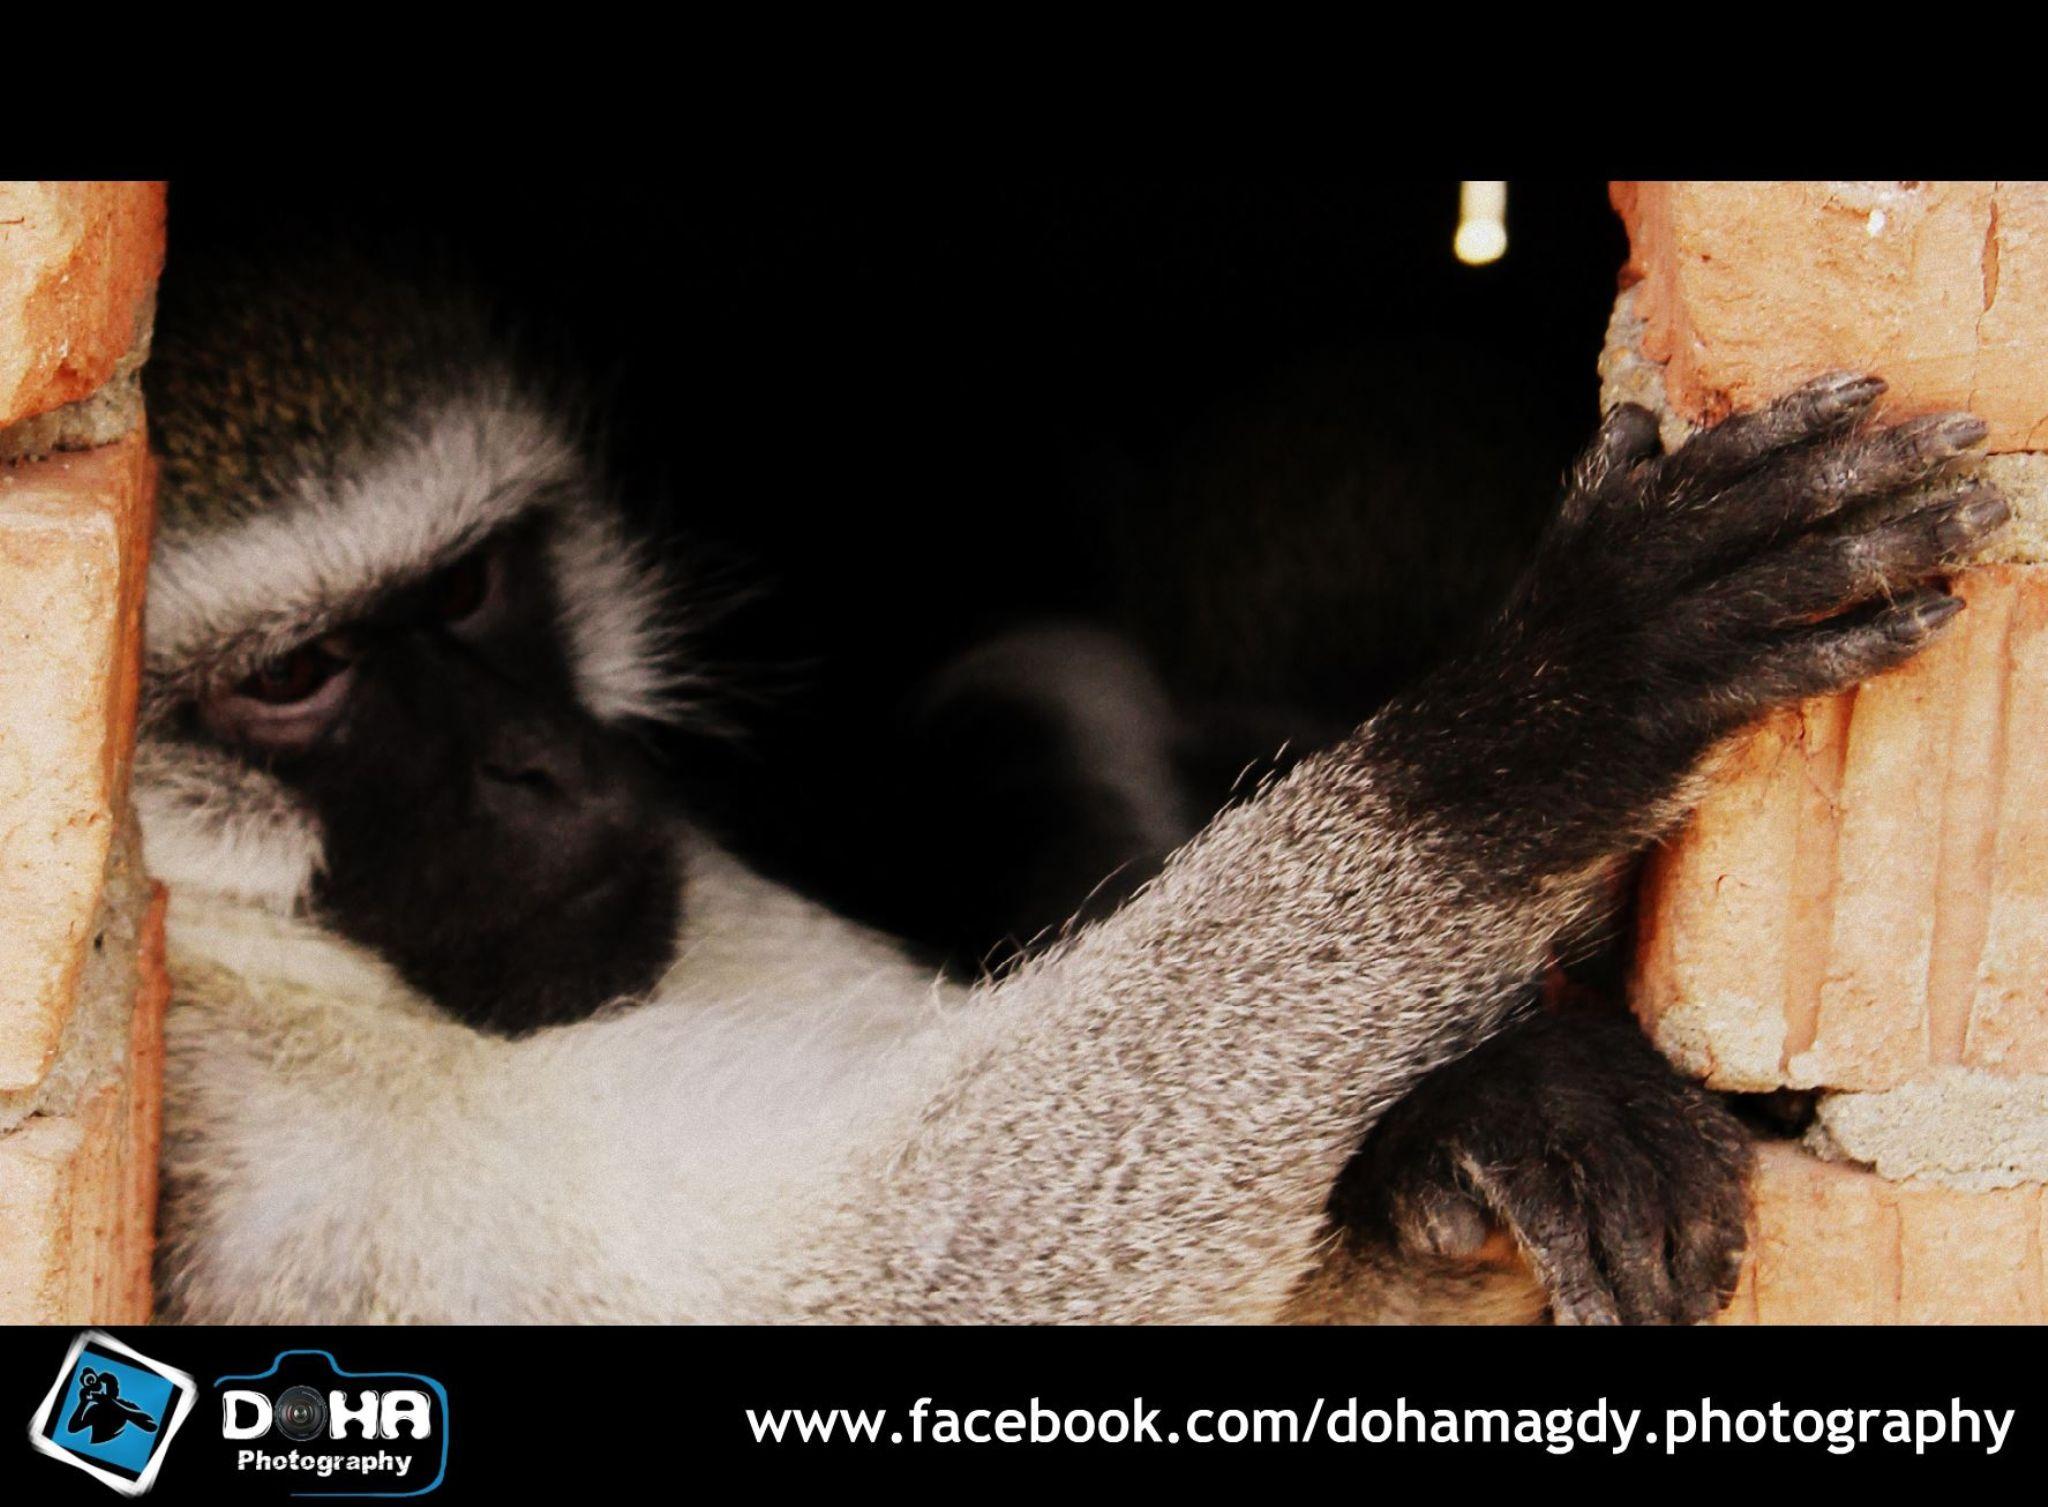 Monkey by Doha Magdy